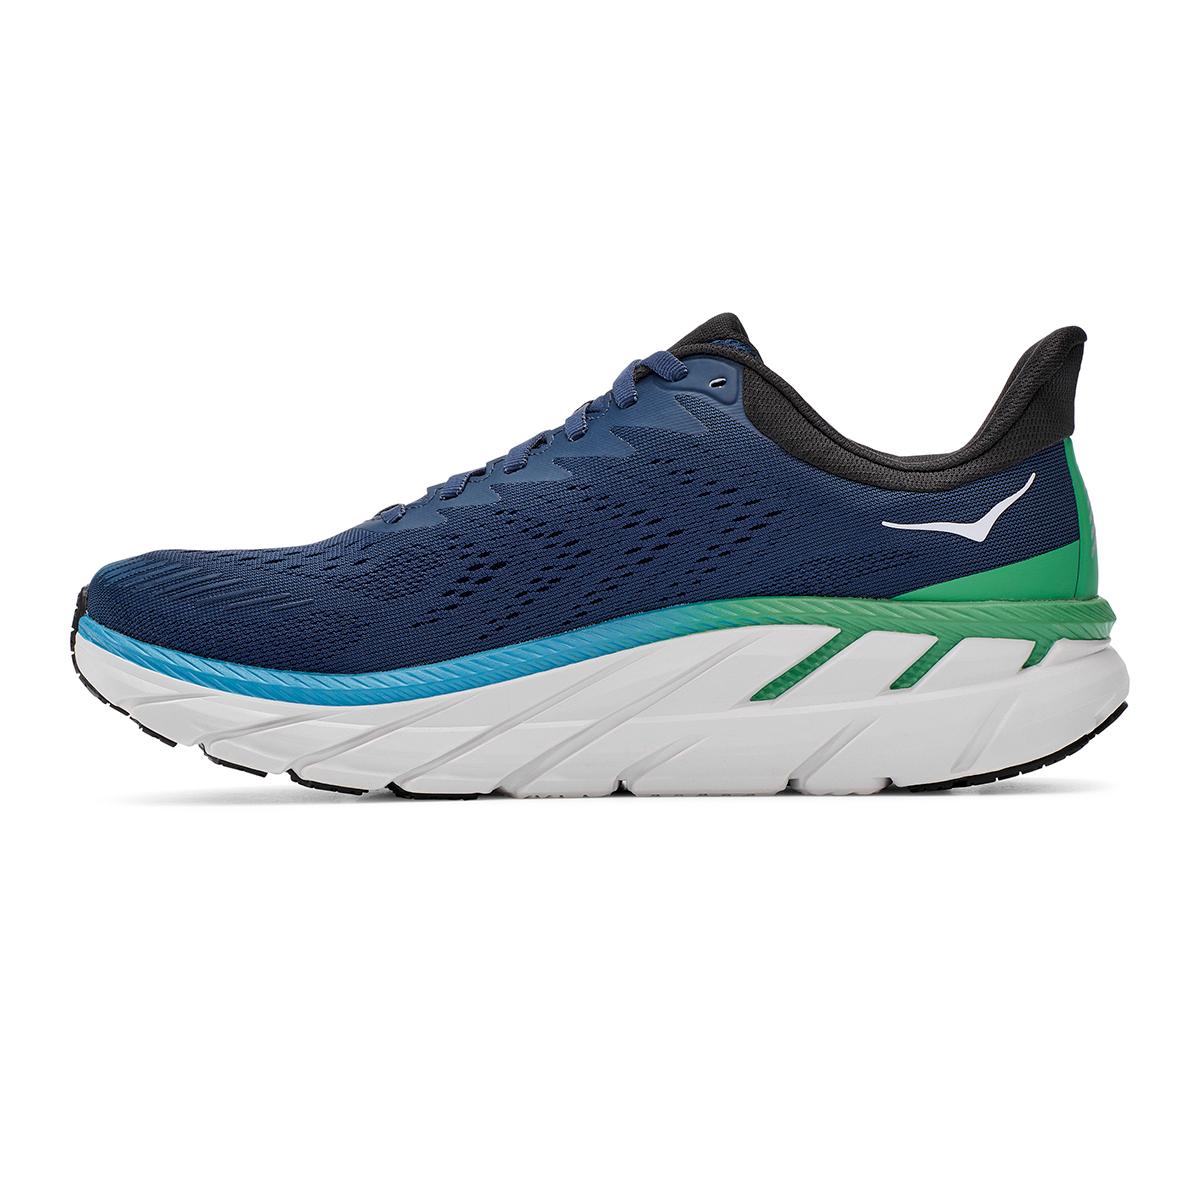 Men's Hoka One One Clifton 7 Running Shoe - Color: Moonlit Ocean/Anthracite - Size: 7 - Width: Regular, Moonlit Ocean/Anthracite, large, image 6